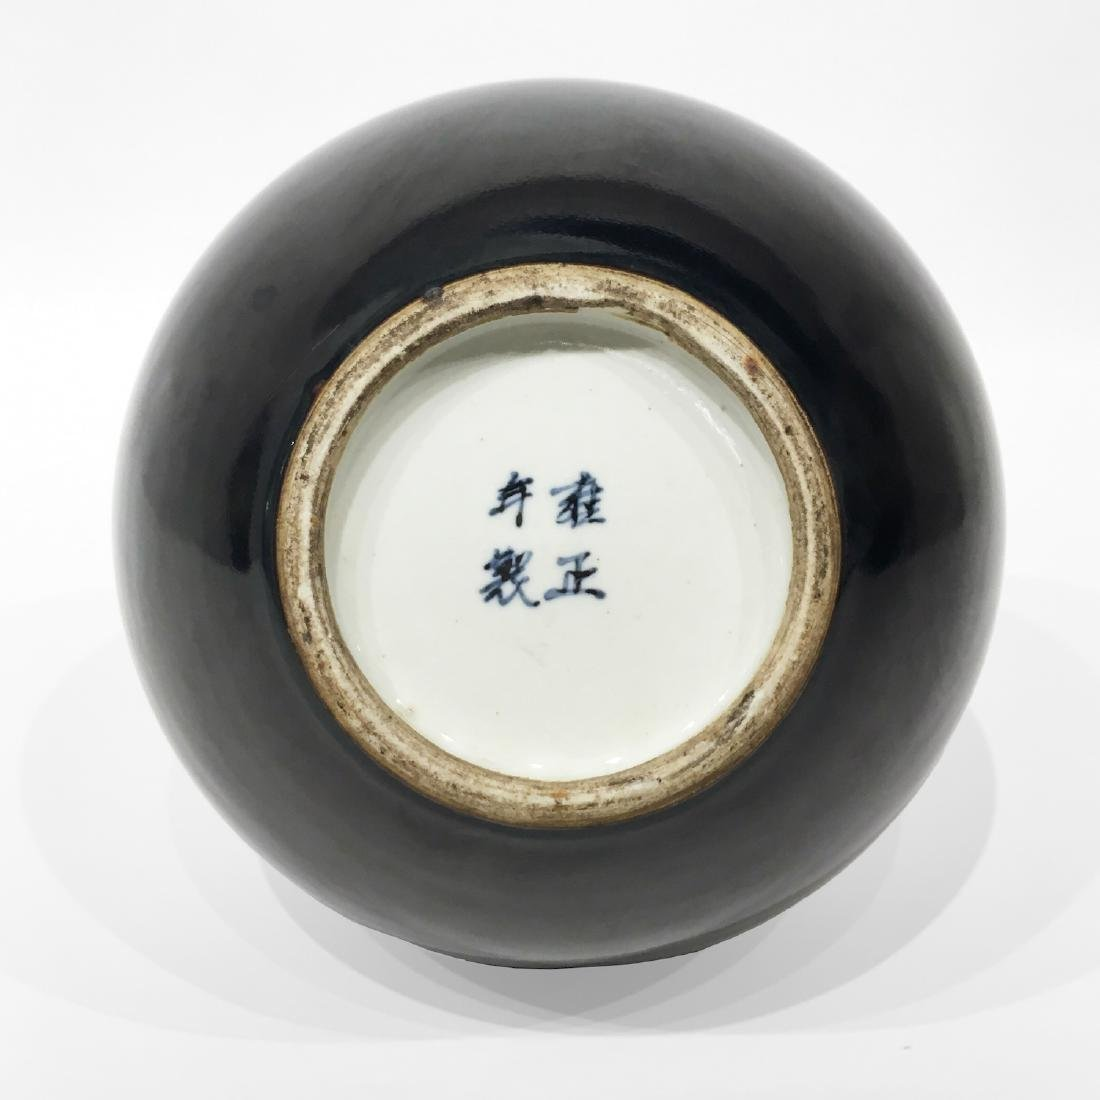 Chinese Black Glazed Porcelain Vase - 3